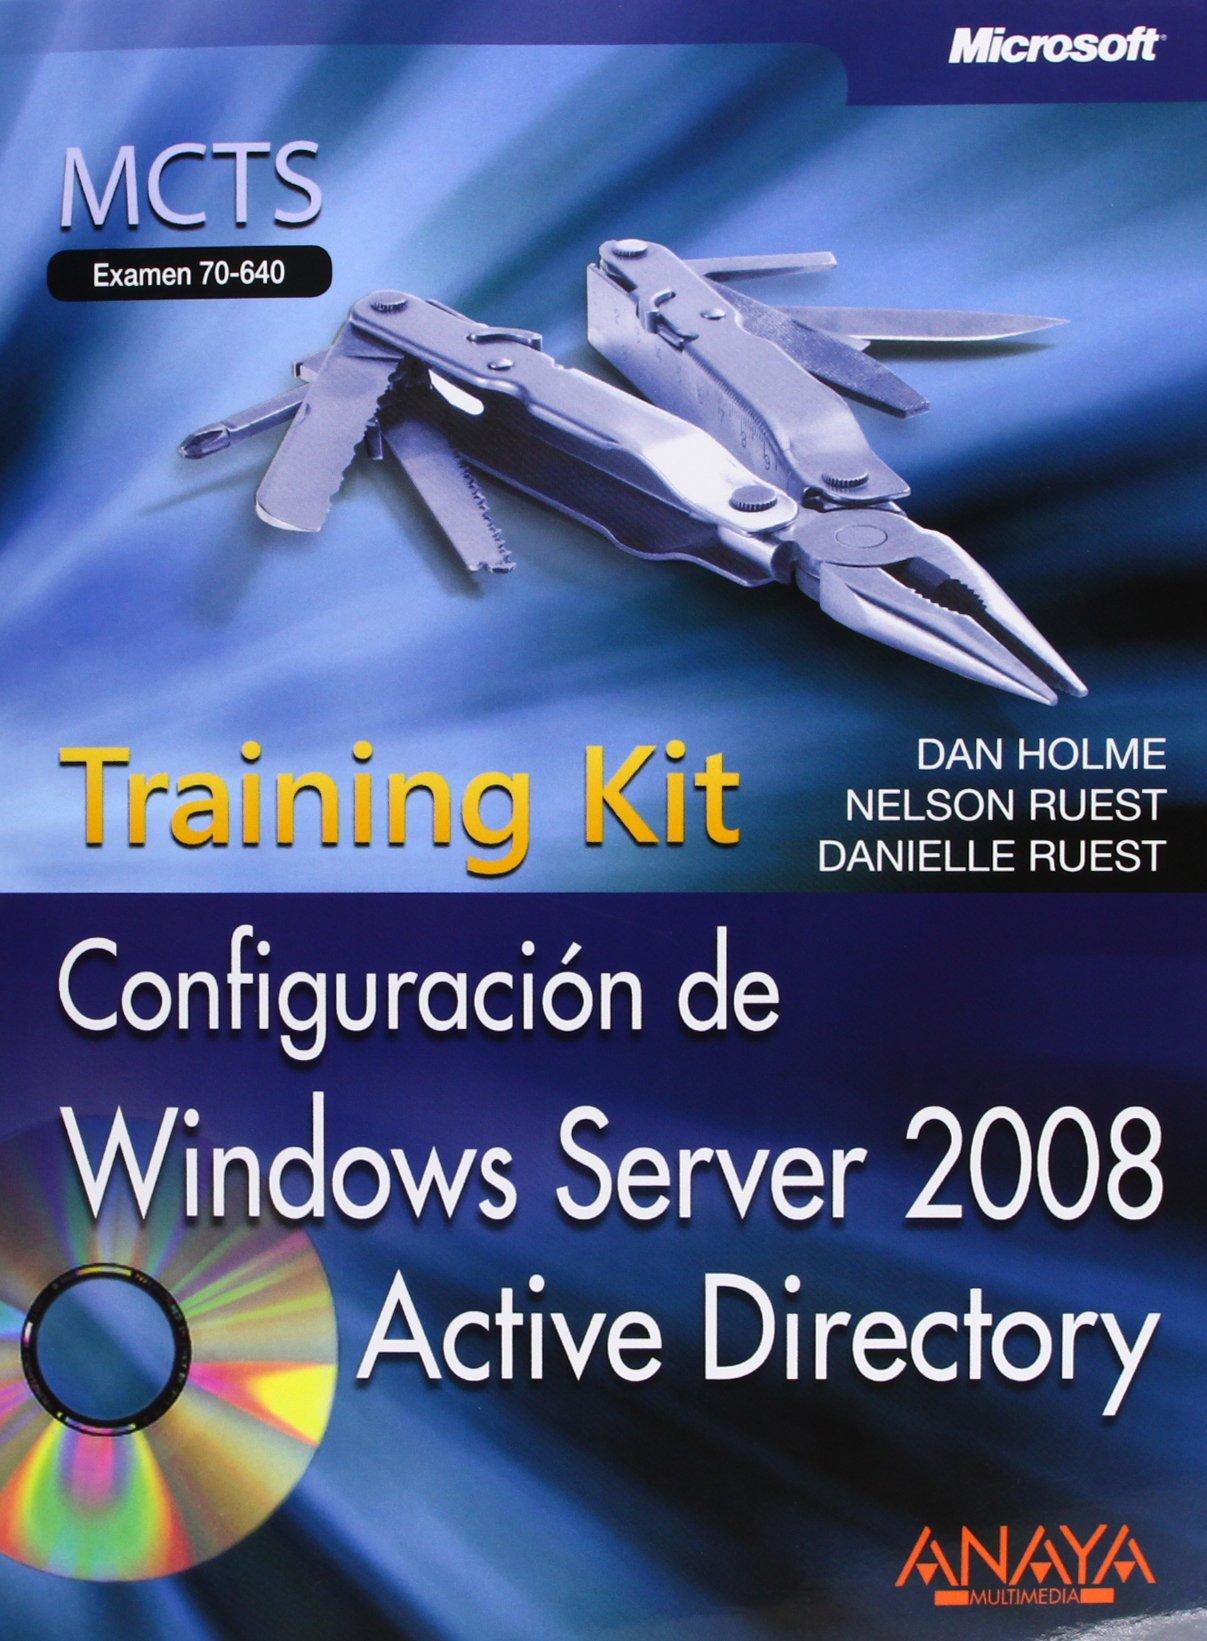 Configuración de Windows Server 2008 Active Directory. Training Kit, MCTS. Examen 70-640 (Manuales Técnicos) Tapa blanda – 16 feb 2009 Dan Holme Nelson Ruest Danielle Ruest ANAYA MULTIMEDIA